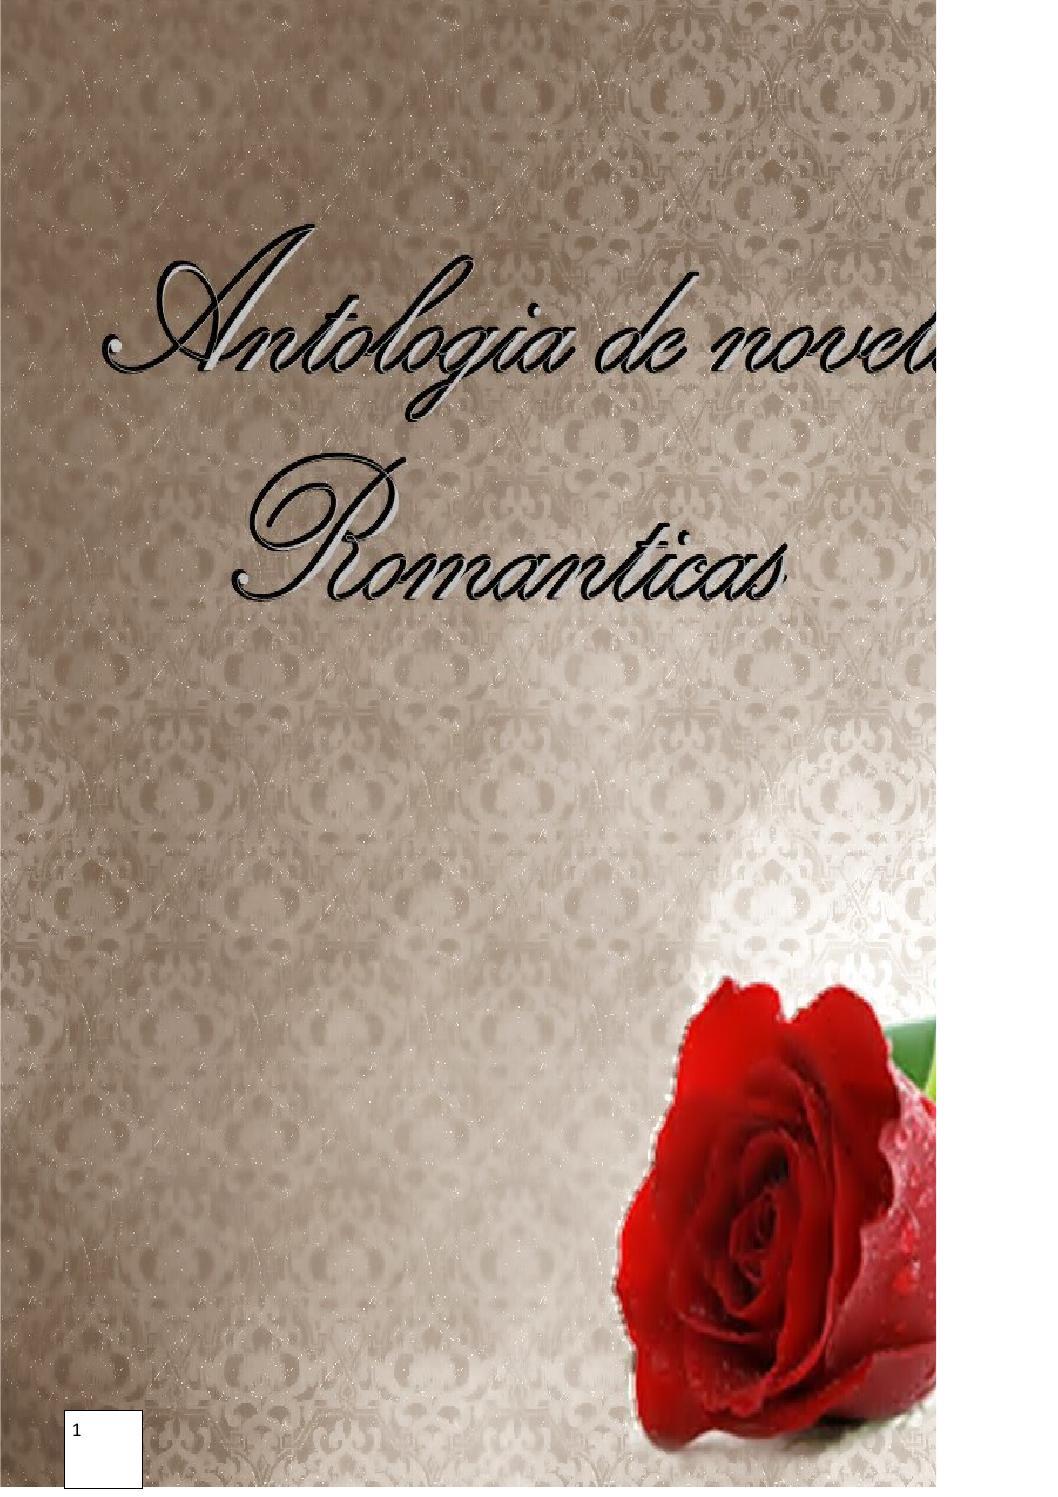 Antologia de Novelas Romanticas by alondra arzate - Issuu